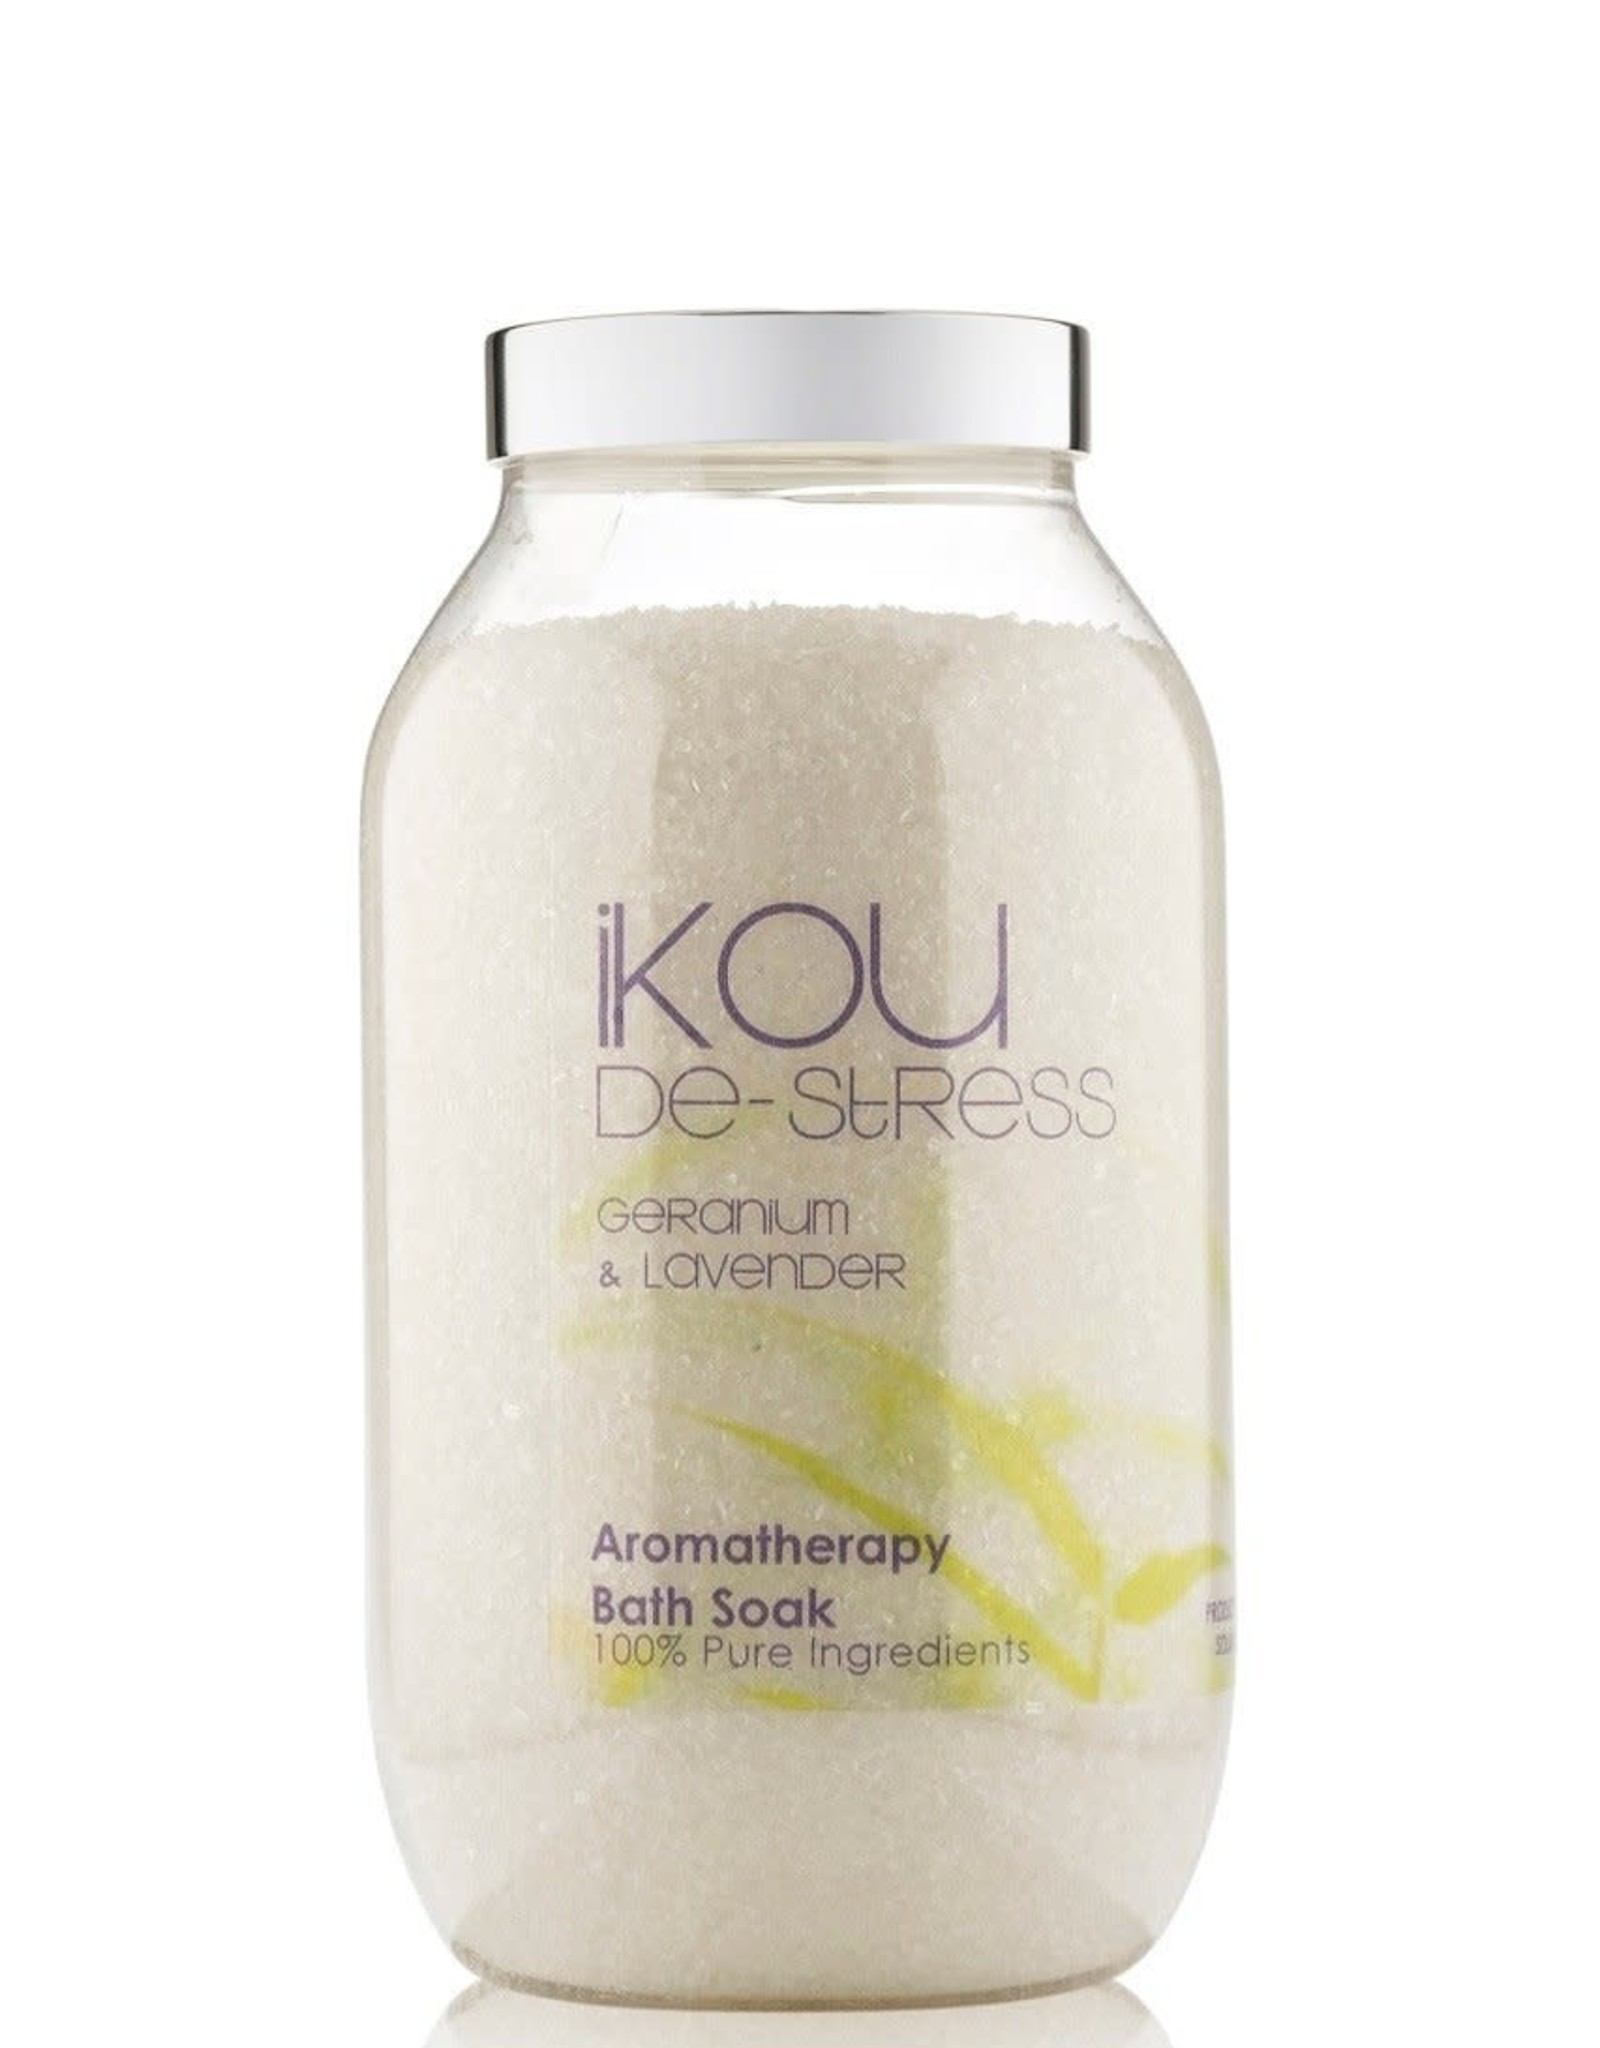 IKOU De-Stress, Bath Soak (850g)